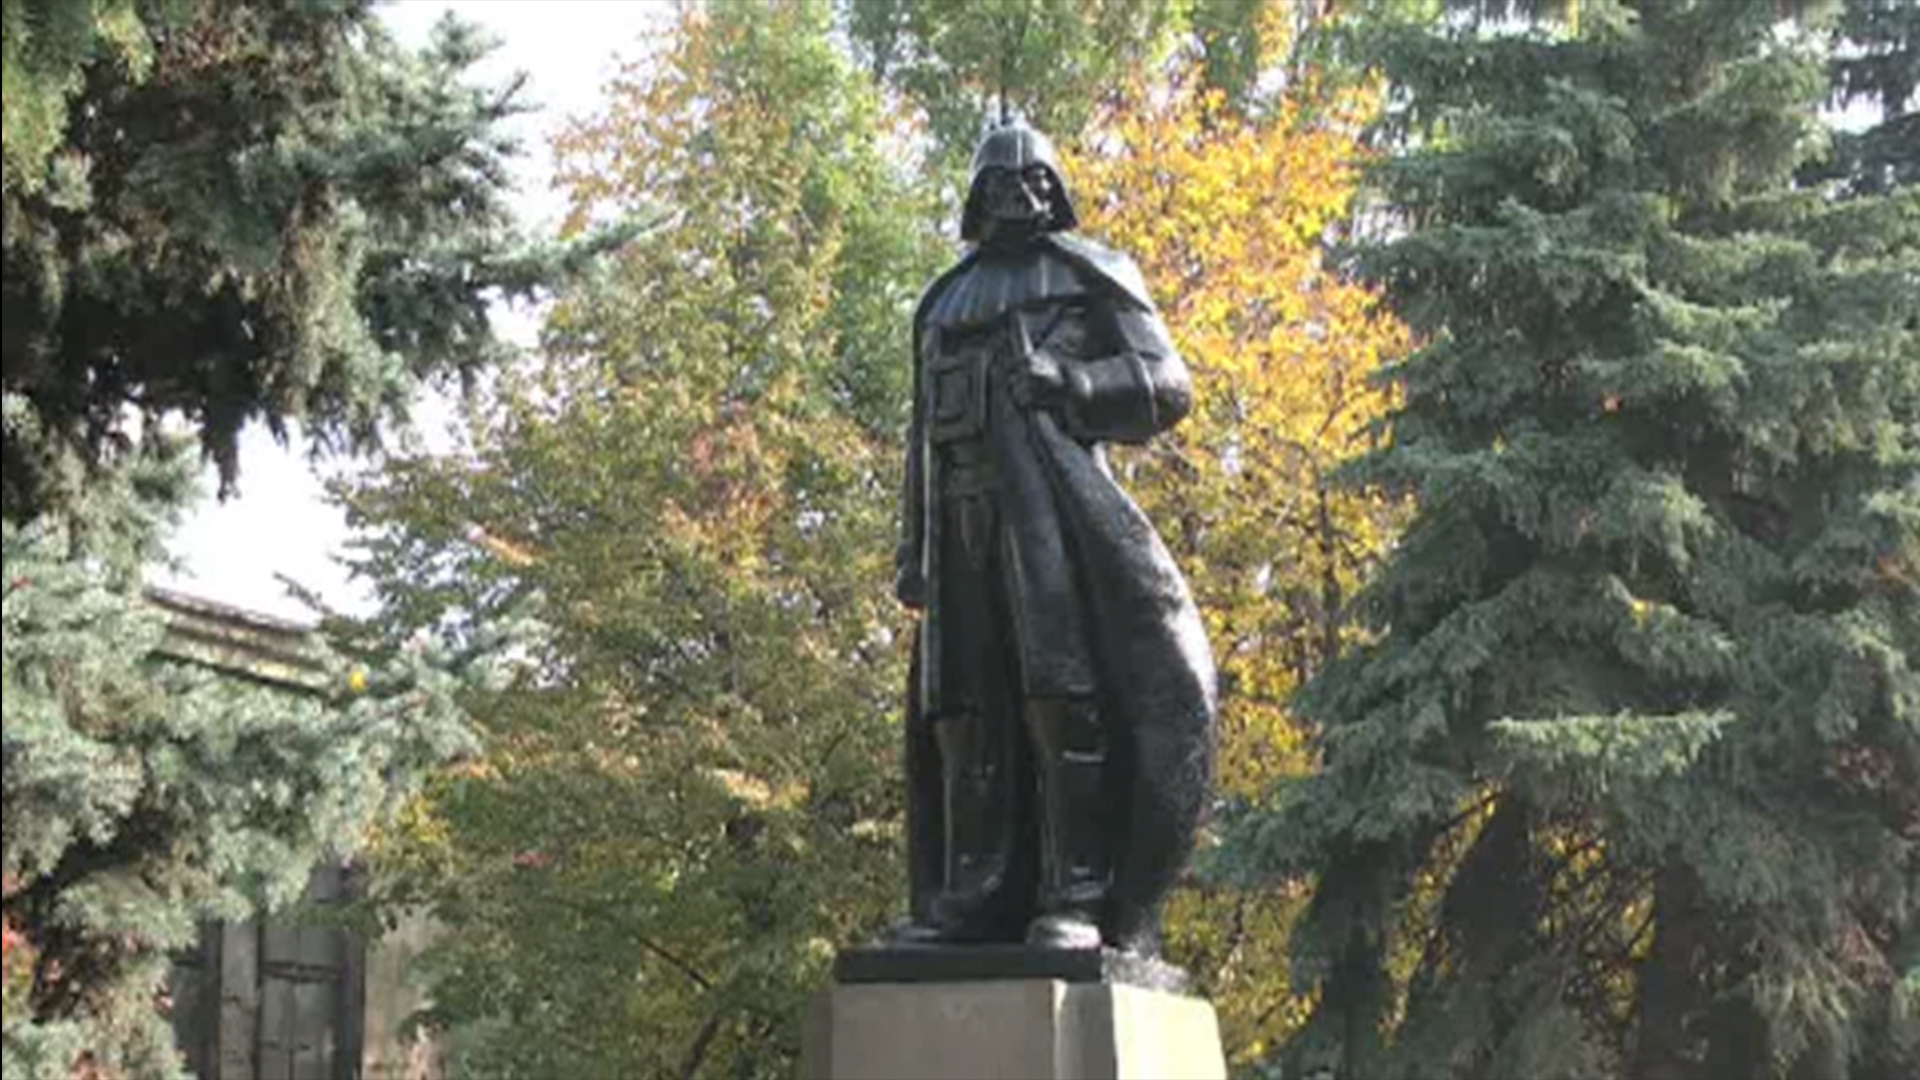 Statue of Lenin in Ukraine Gets Transformed Into Darth Vader Monument